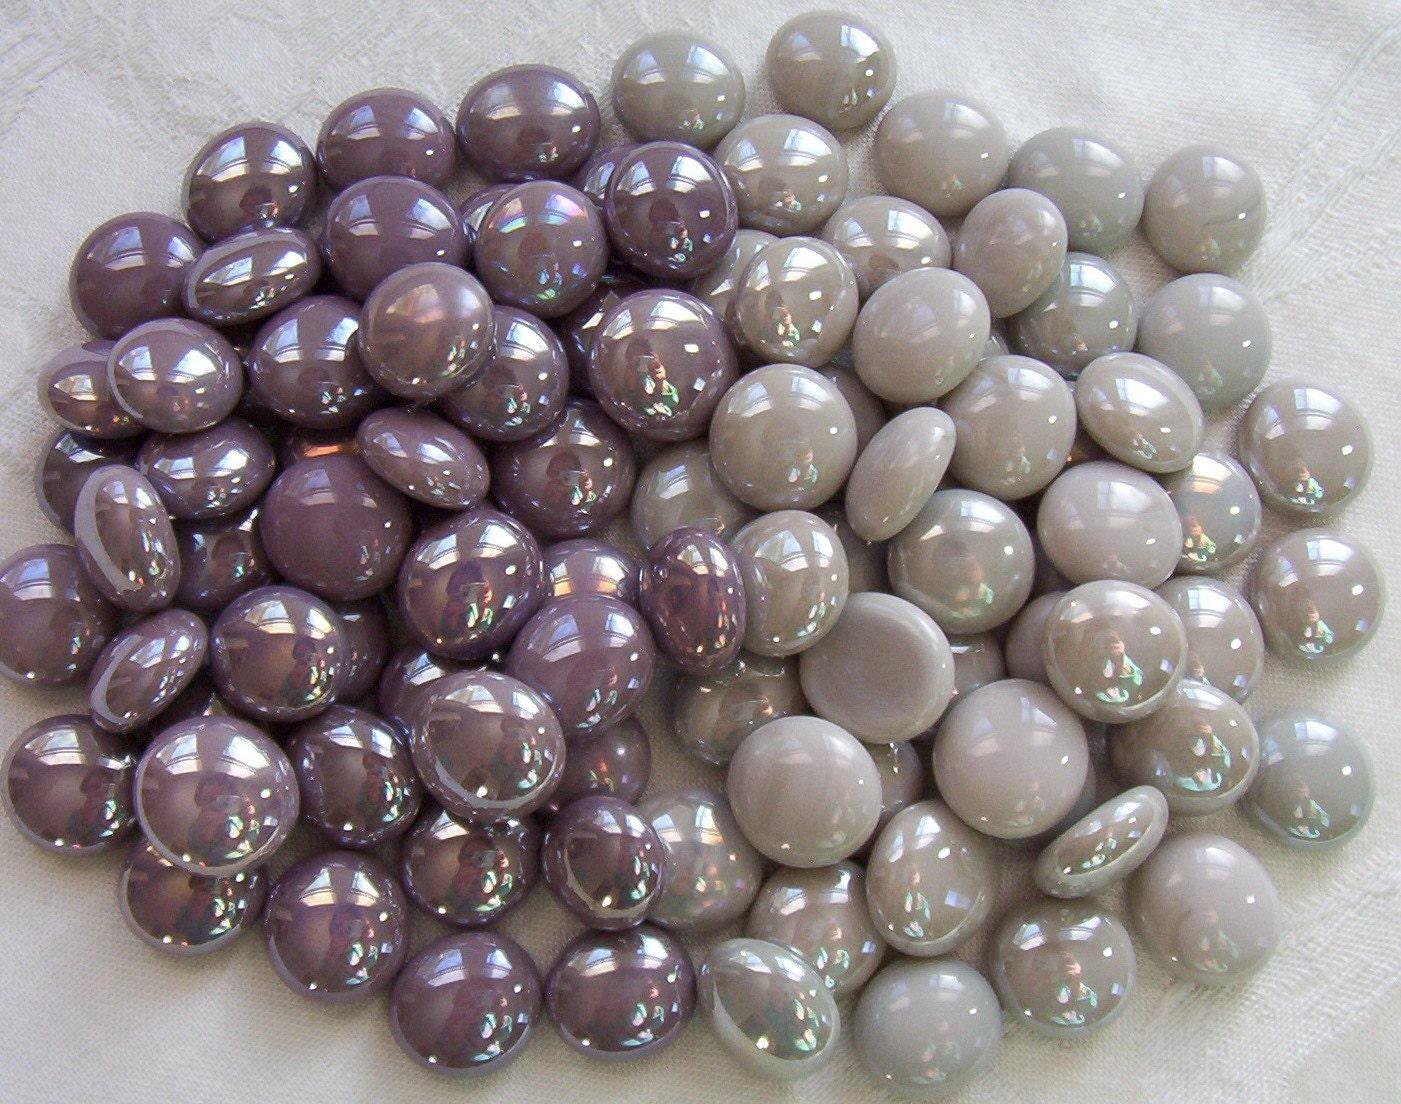 50 glass gems purple plum and gray mix